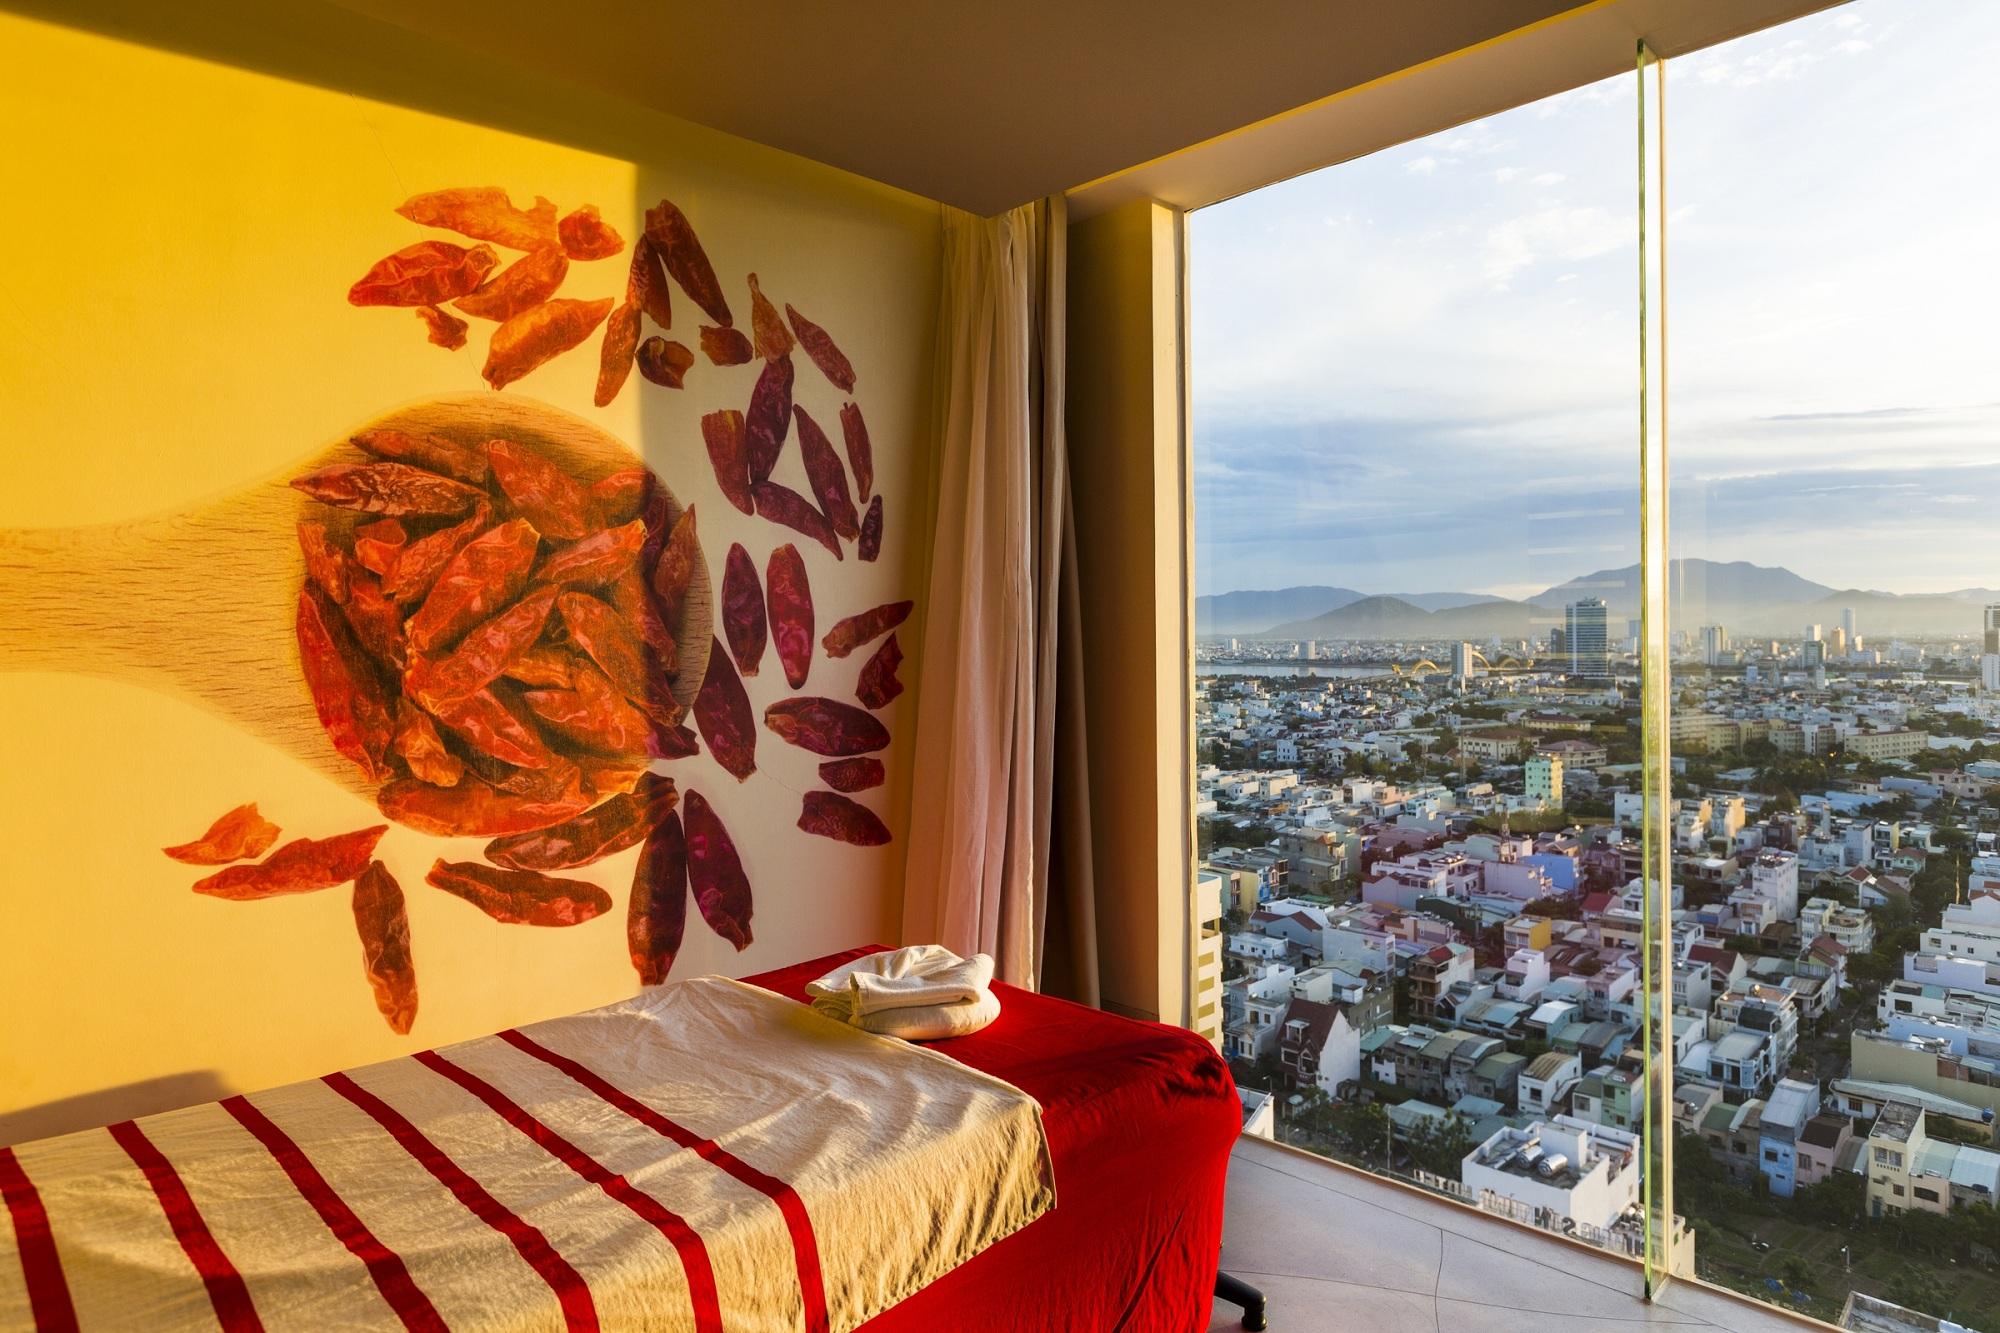 Spice Spa A La Carte Danang Beach Hotel 200 Vo Nguyen Giap Danang Fantasticity Com 06